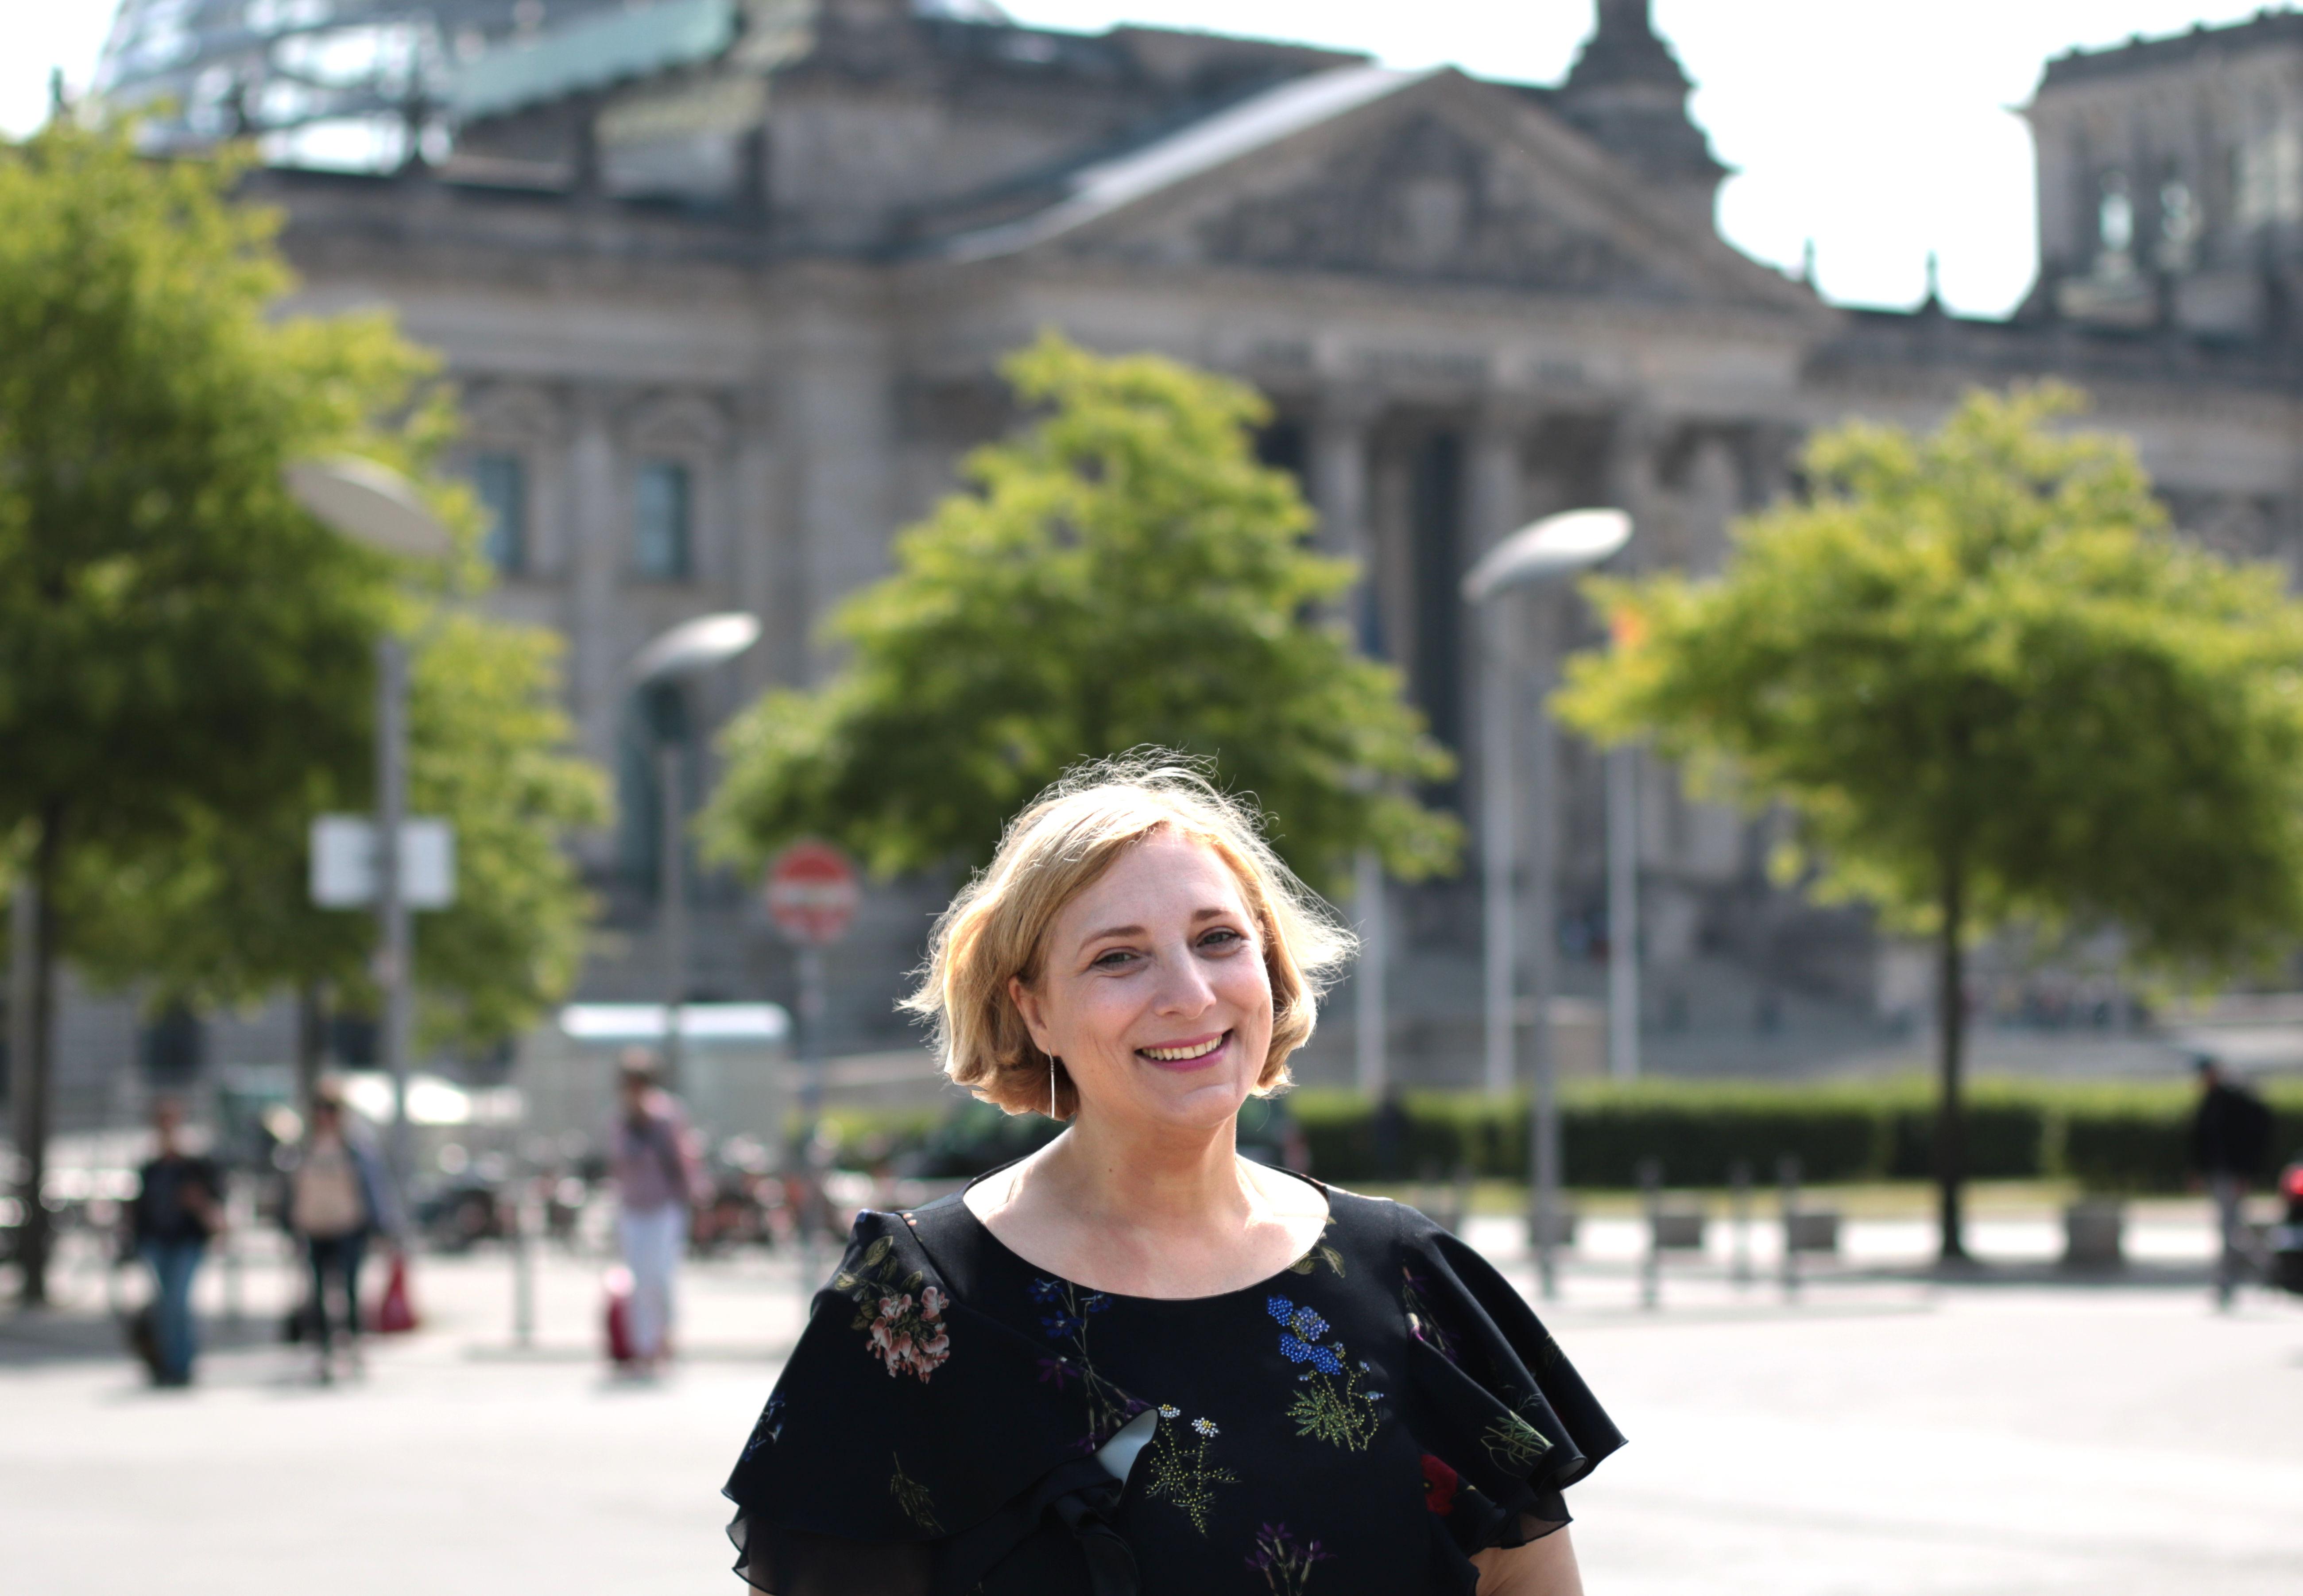 Dr. Daniela De Ridder ruft auf zur Teilnahme am Dieter Baacke Sonderpreis 2018